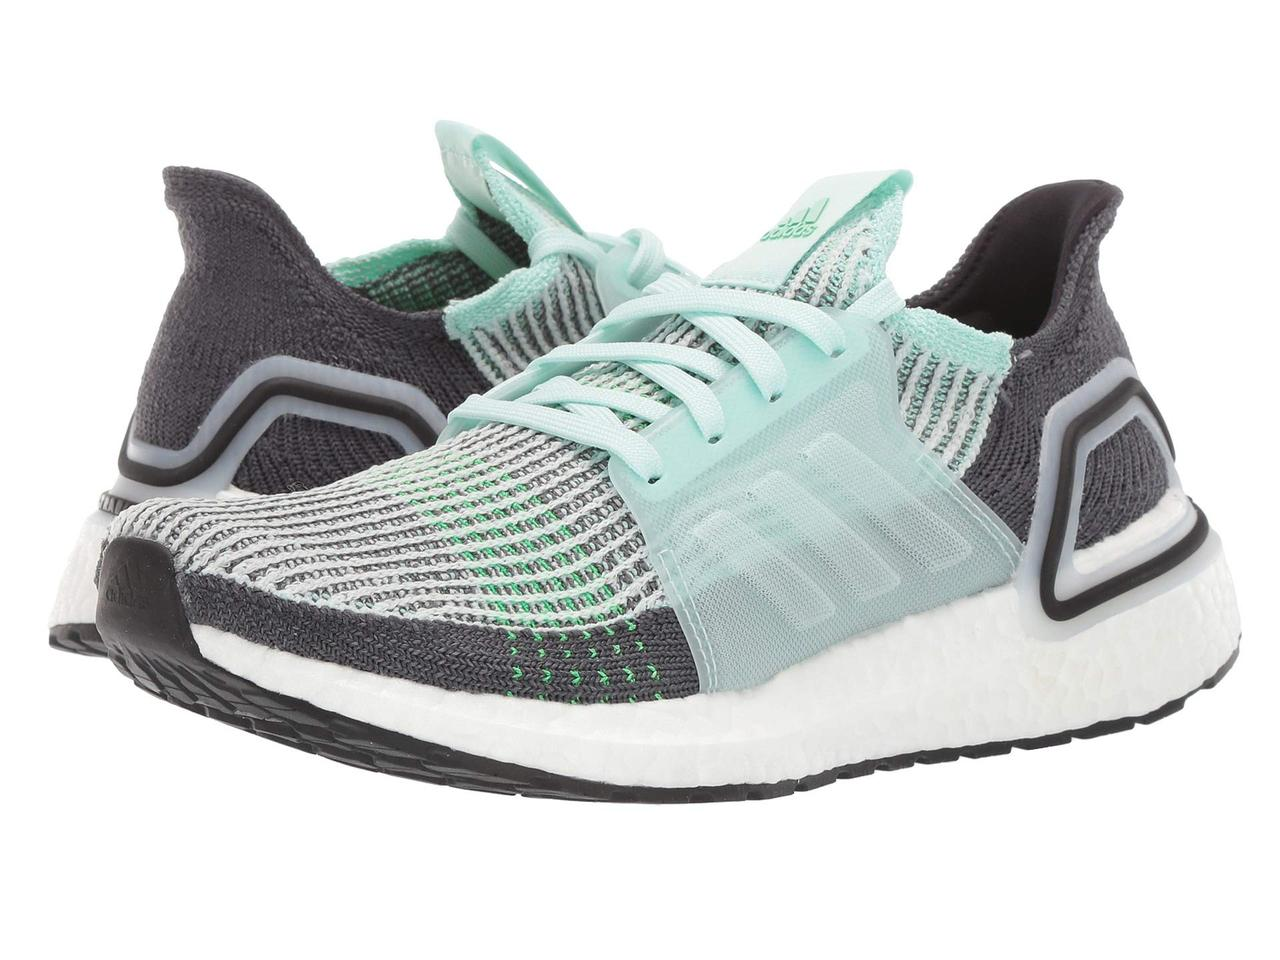 02eeacd281ae5c Кроссовки/Кеды (Оригинал) adidas Running Ultraboost 19 Ice Mint/Ice Mint/